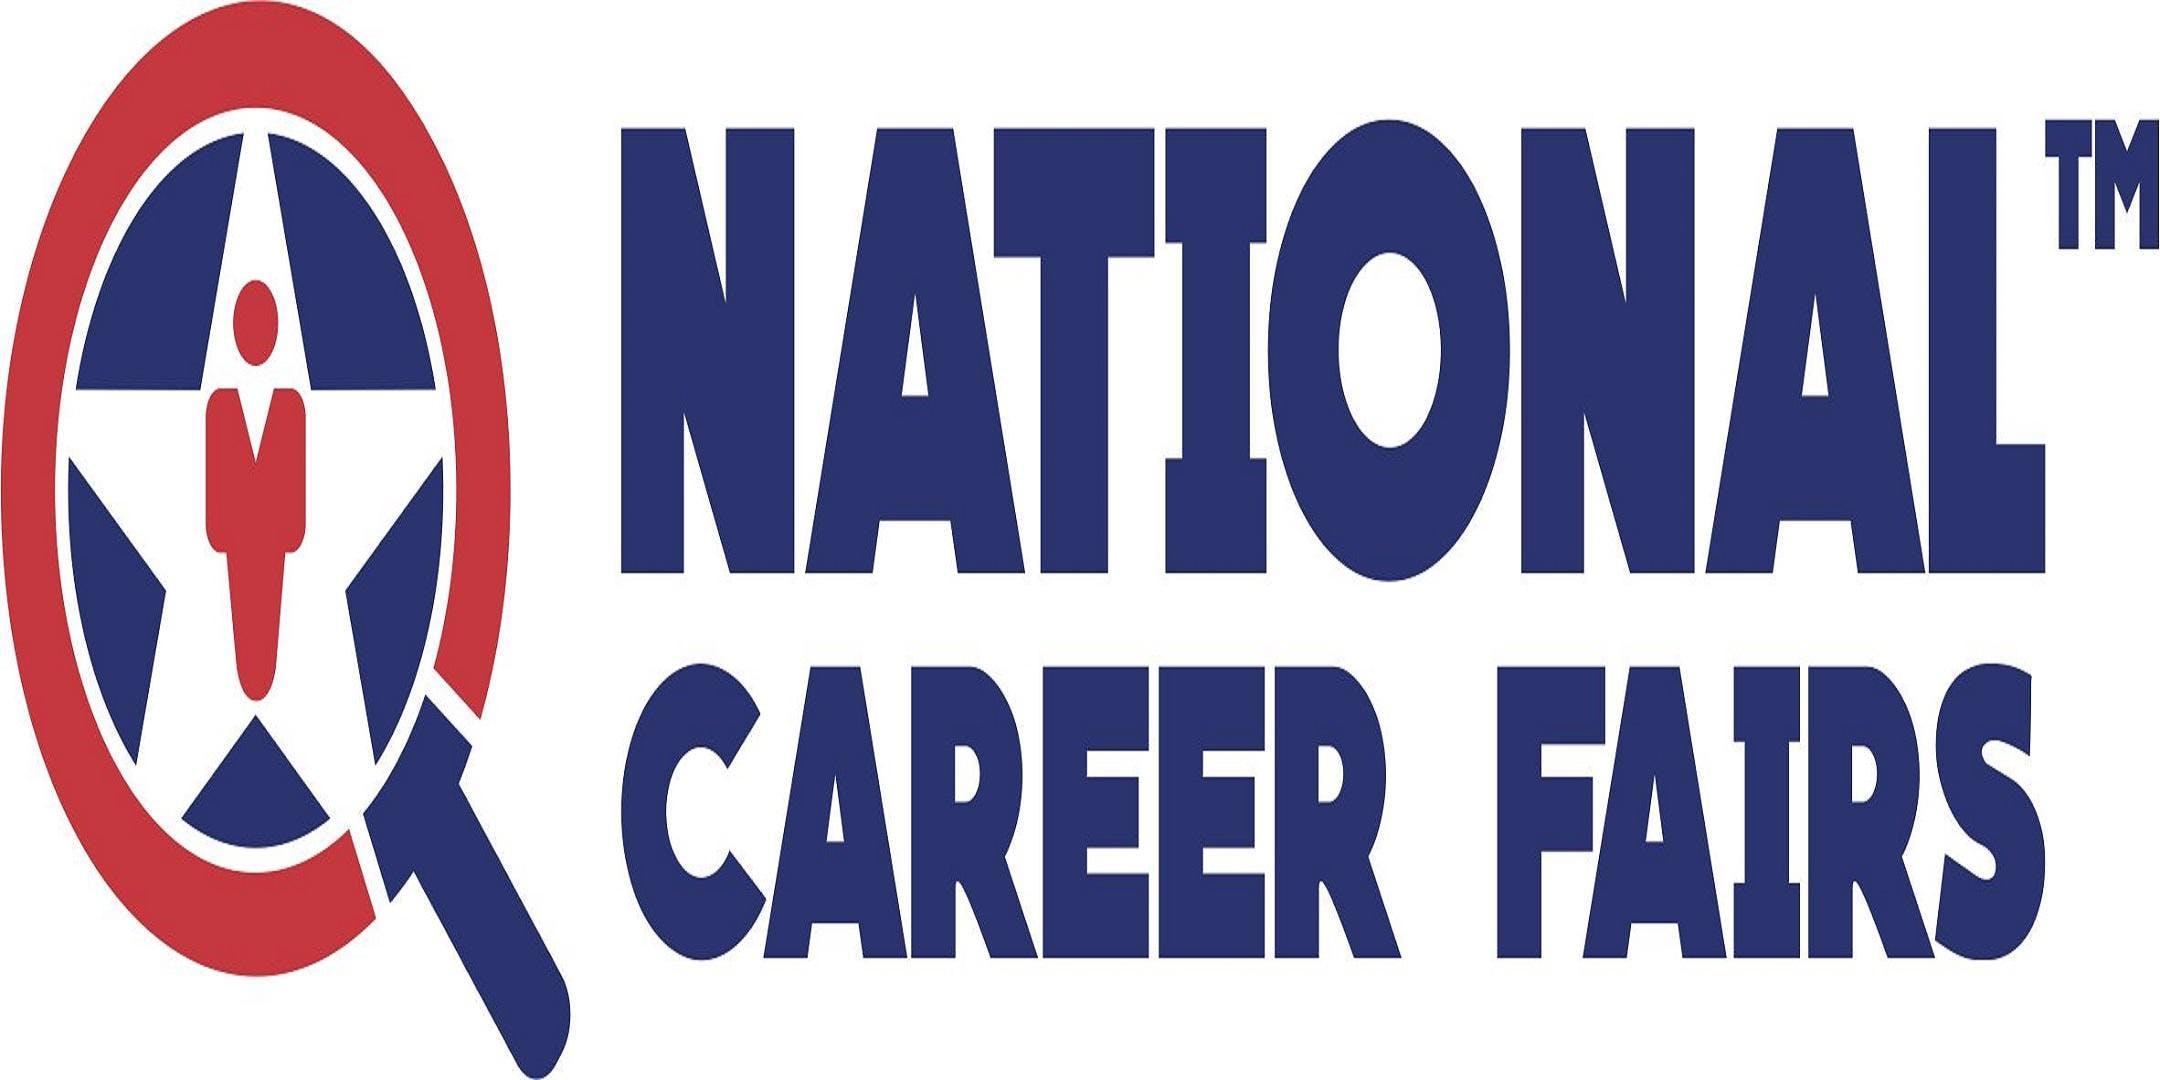 Mesa Career Fair - October 30, 2018 - Live Recruiting/Hiring Event